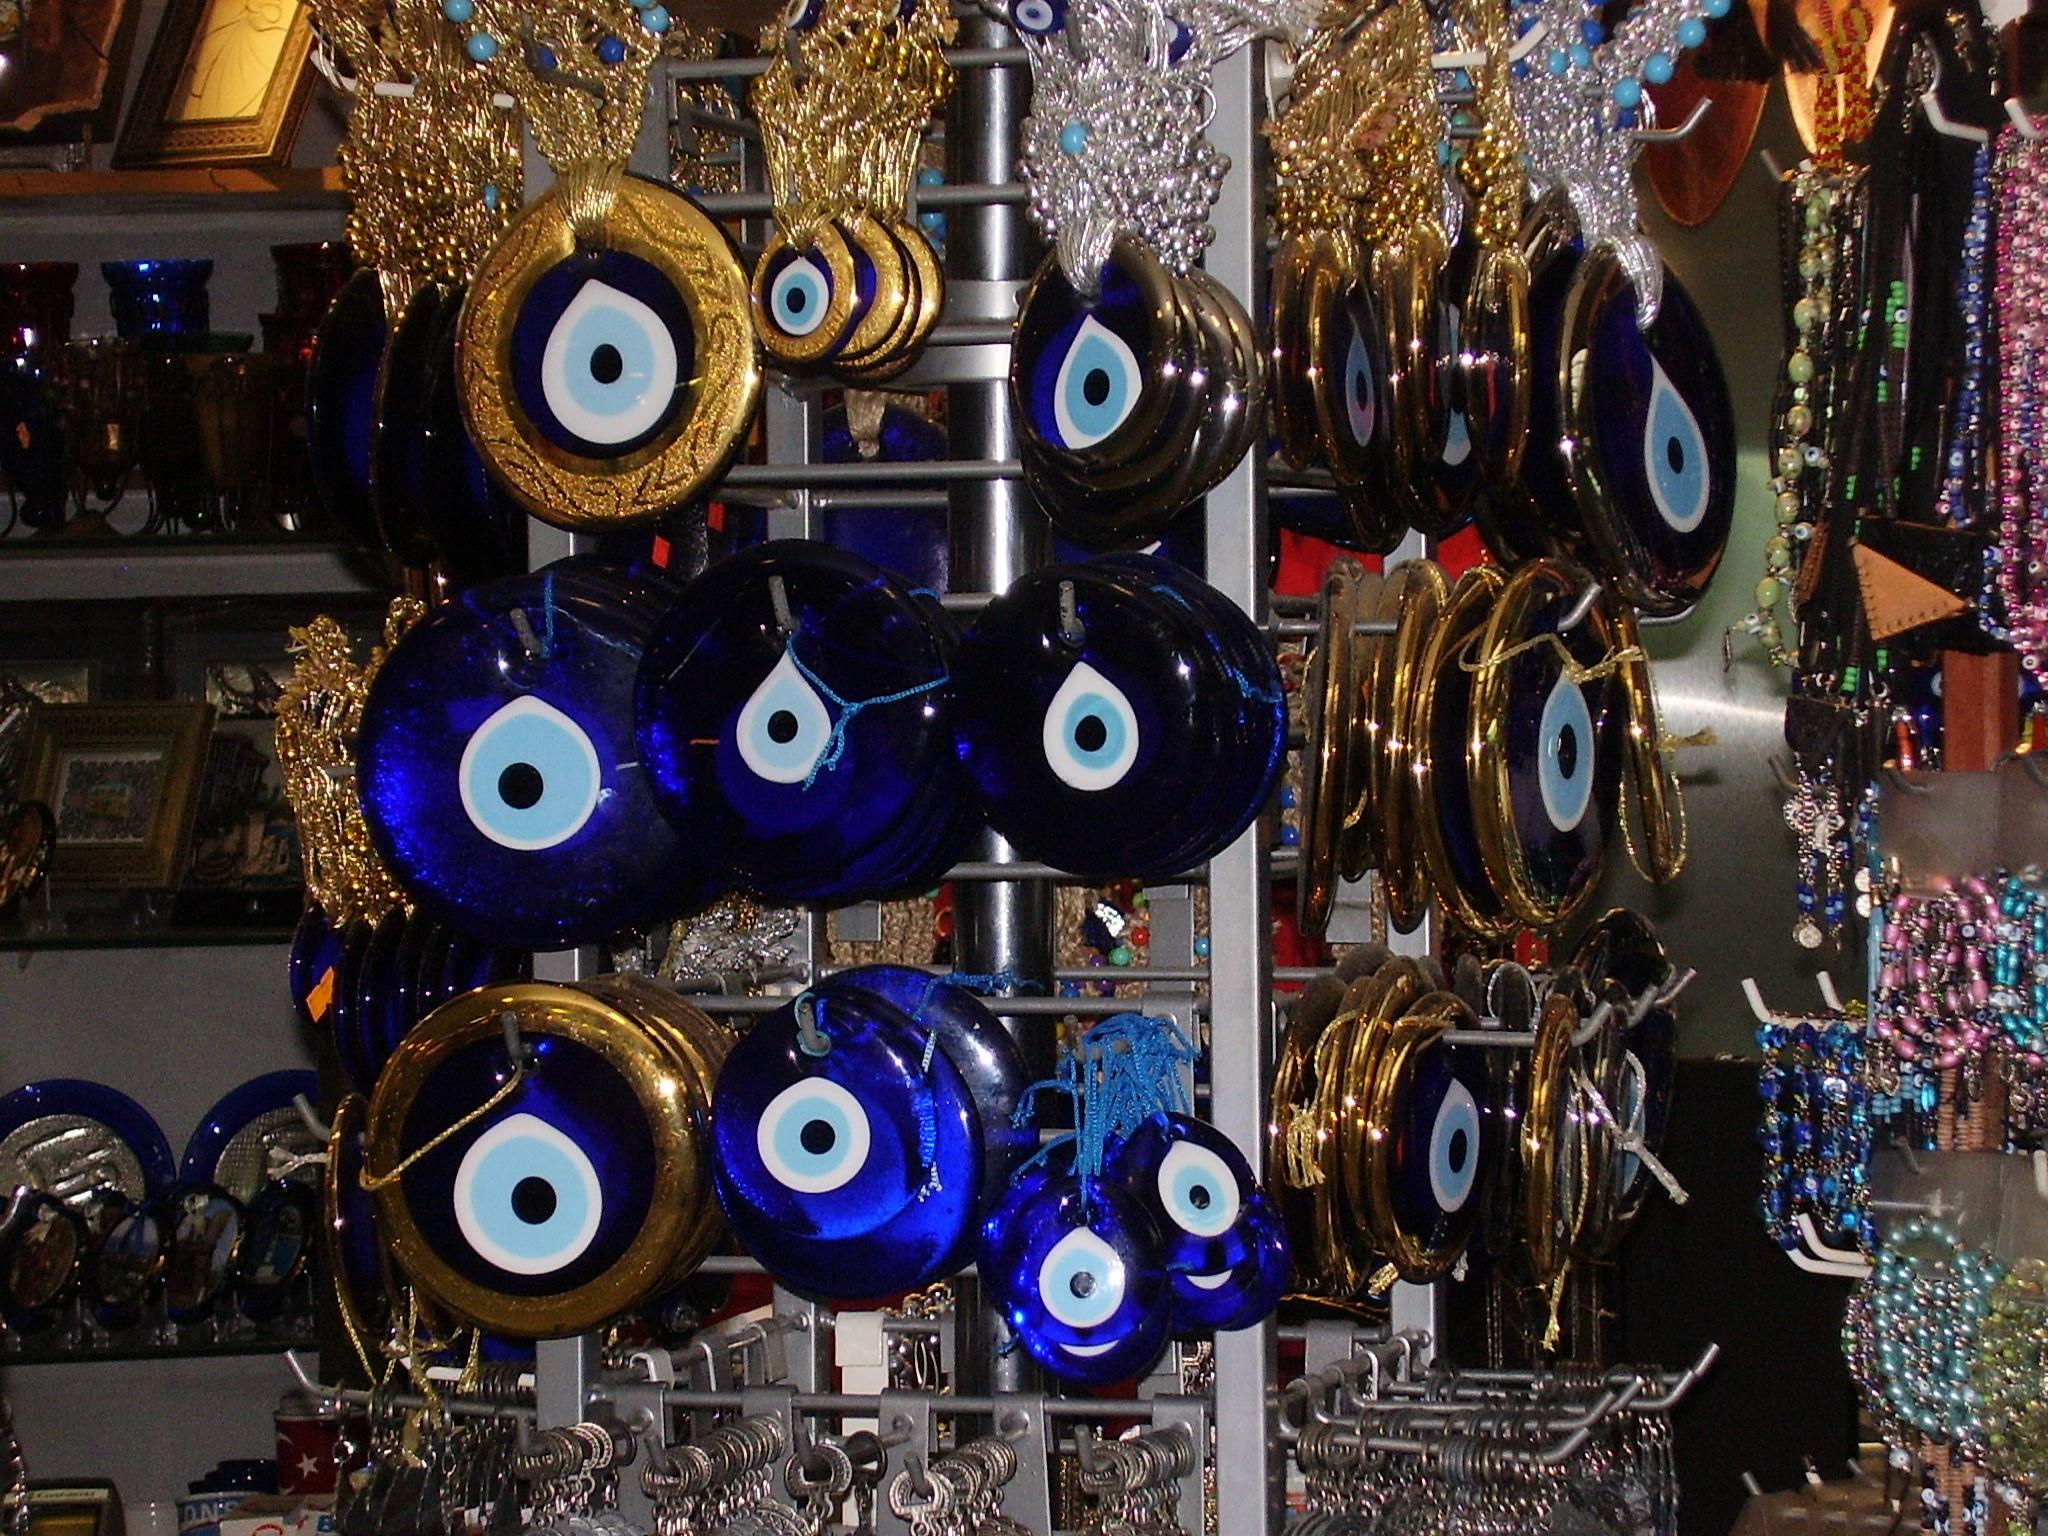 Evil eye - Wikipedia